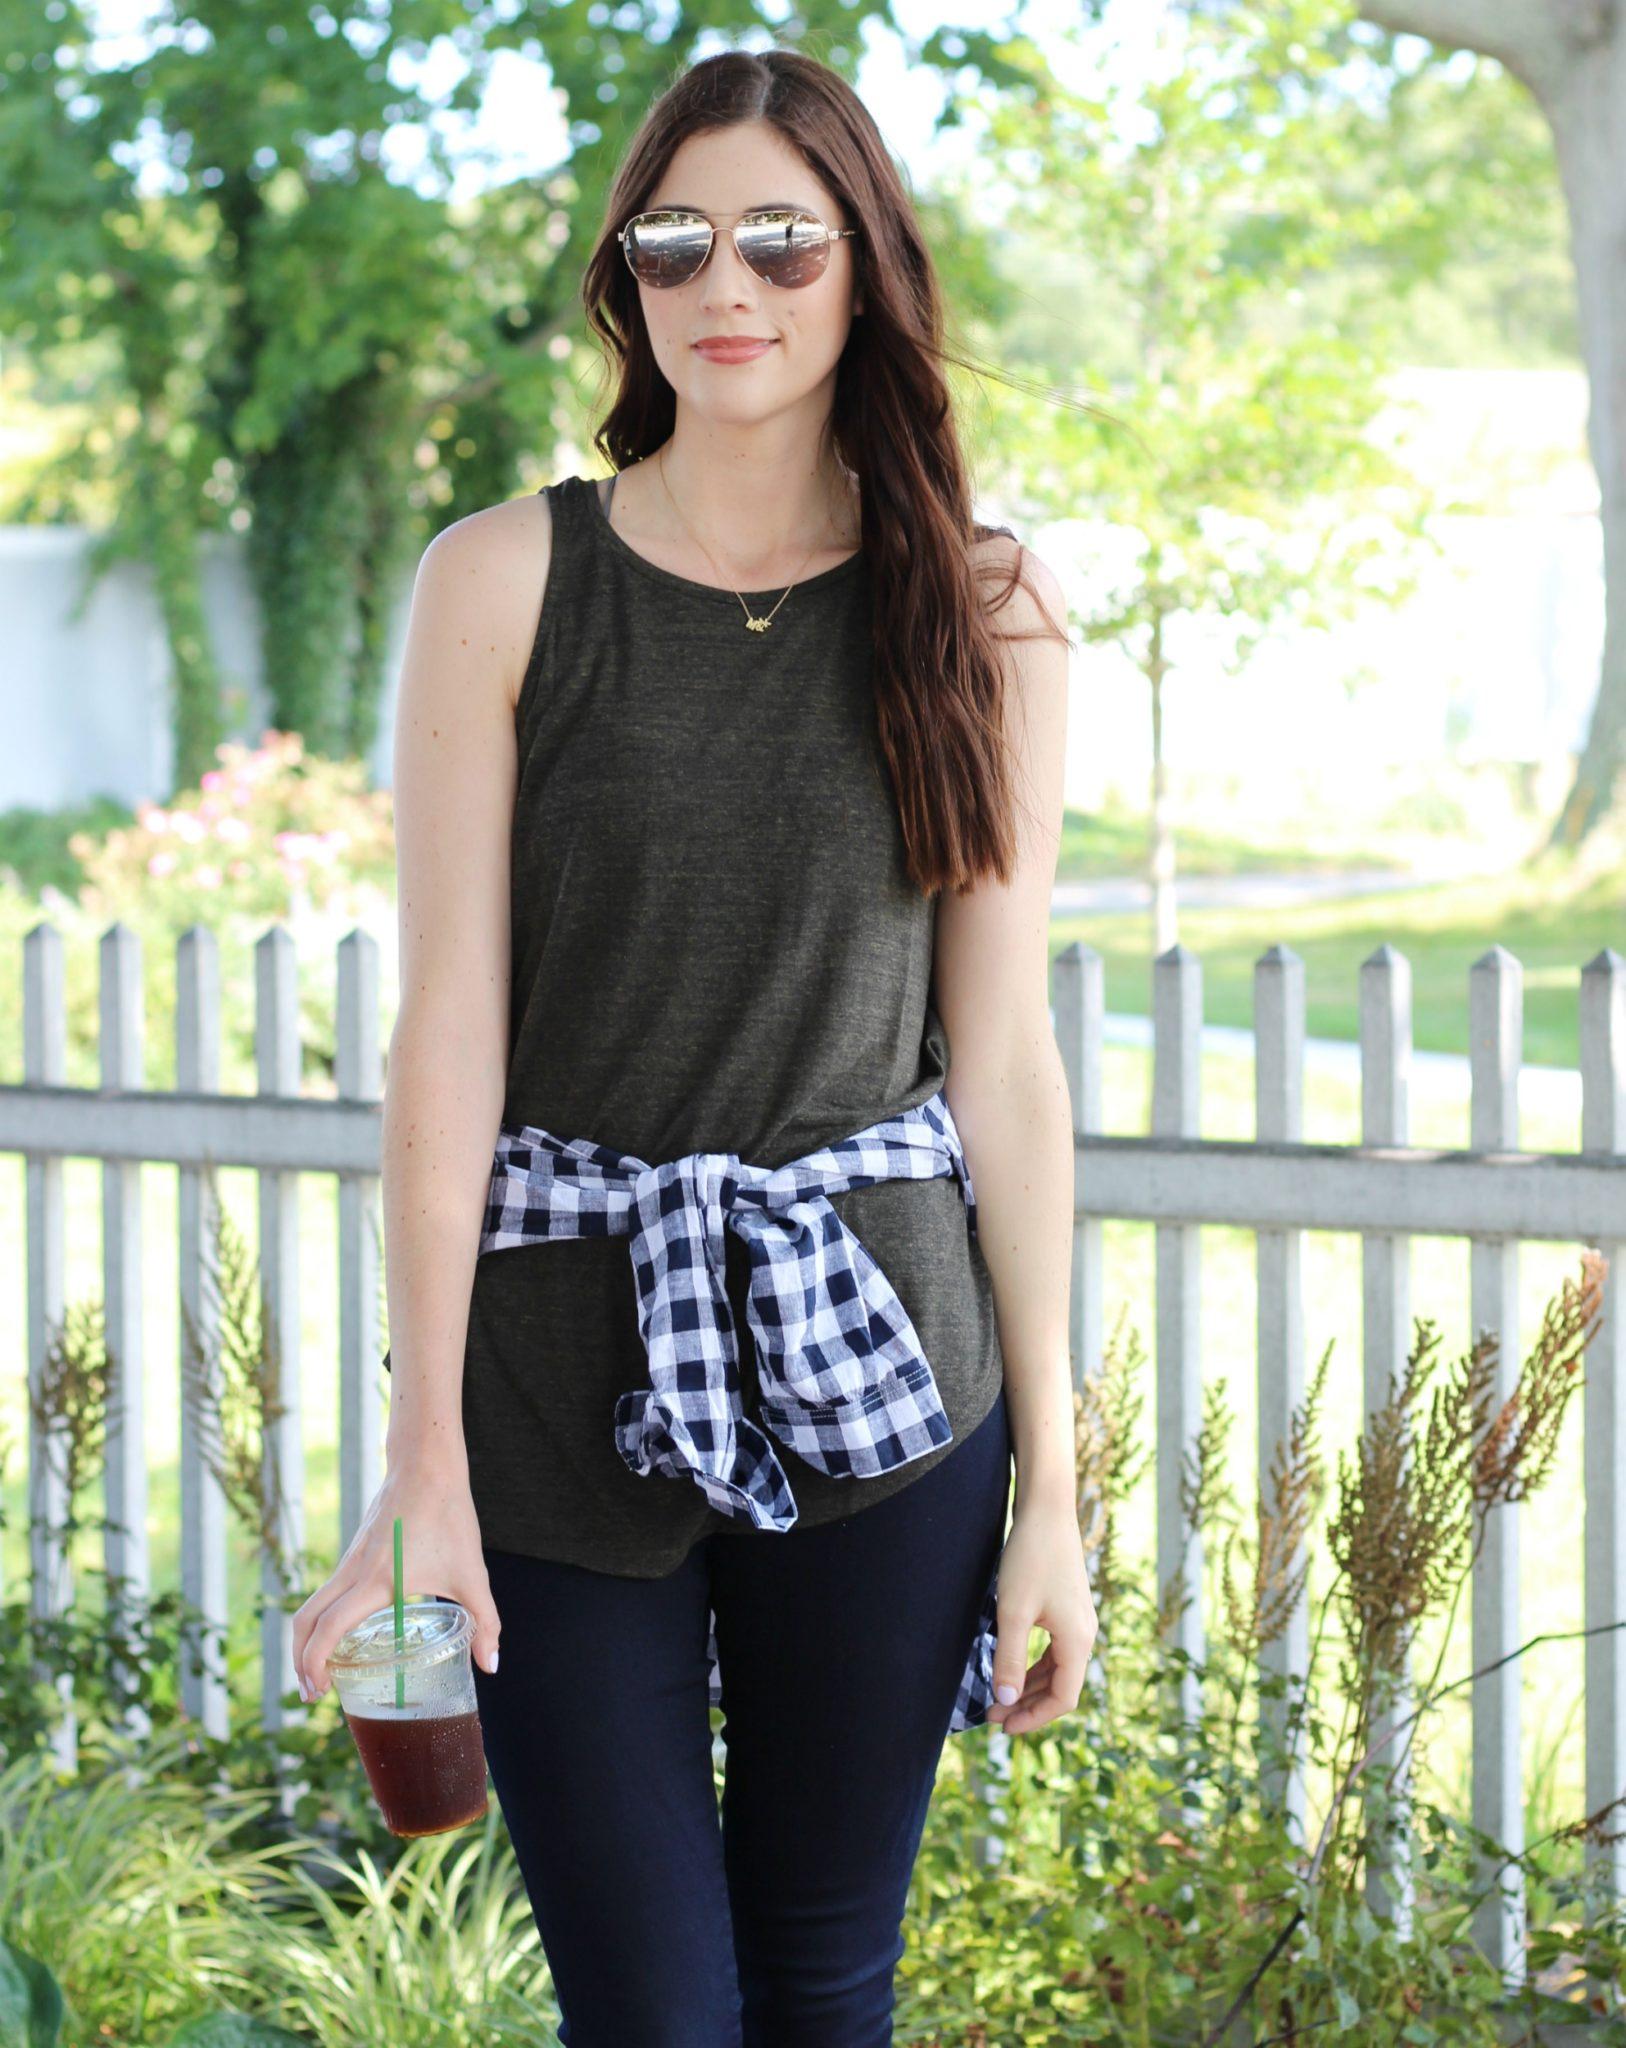 Fall outfit inspiration | plaid shirt around the waist